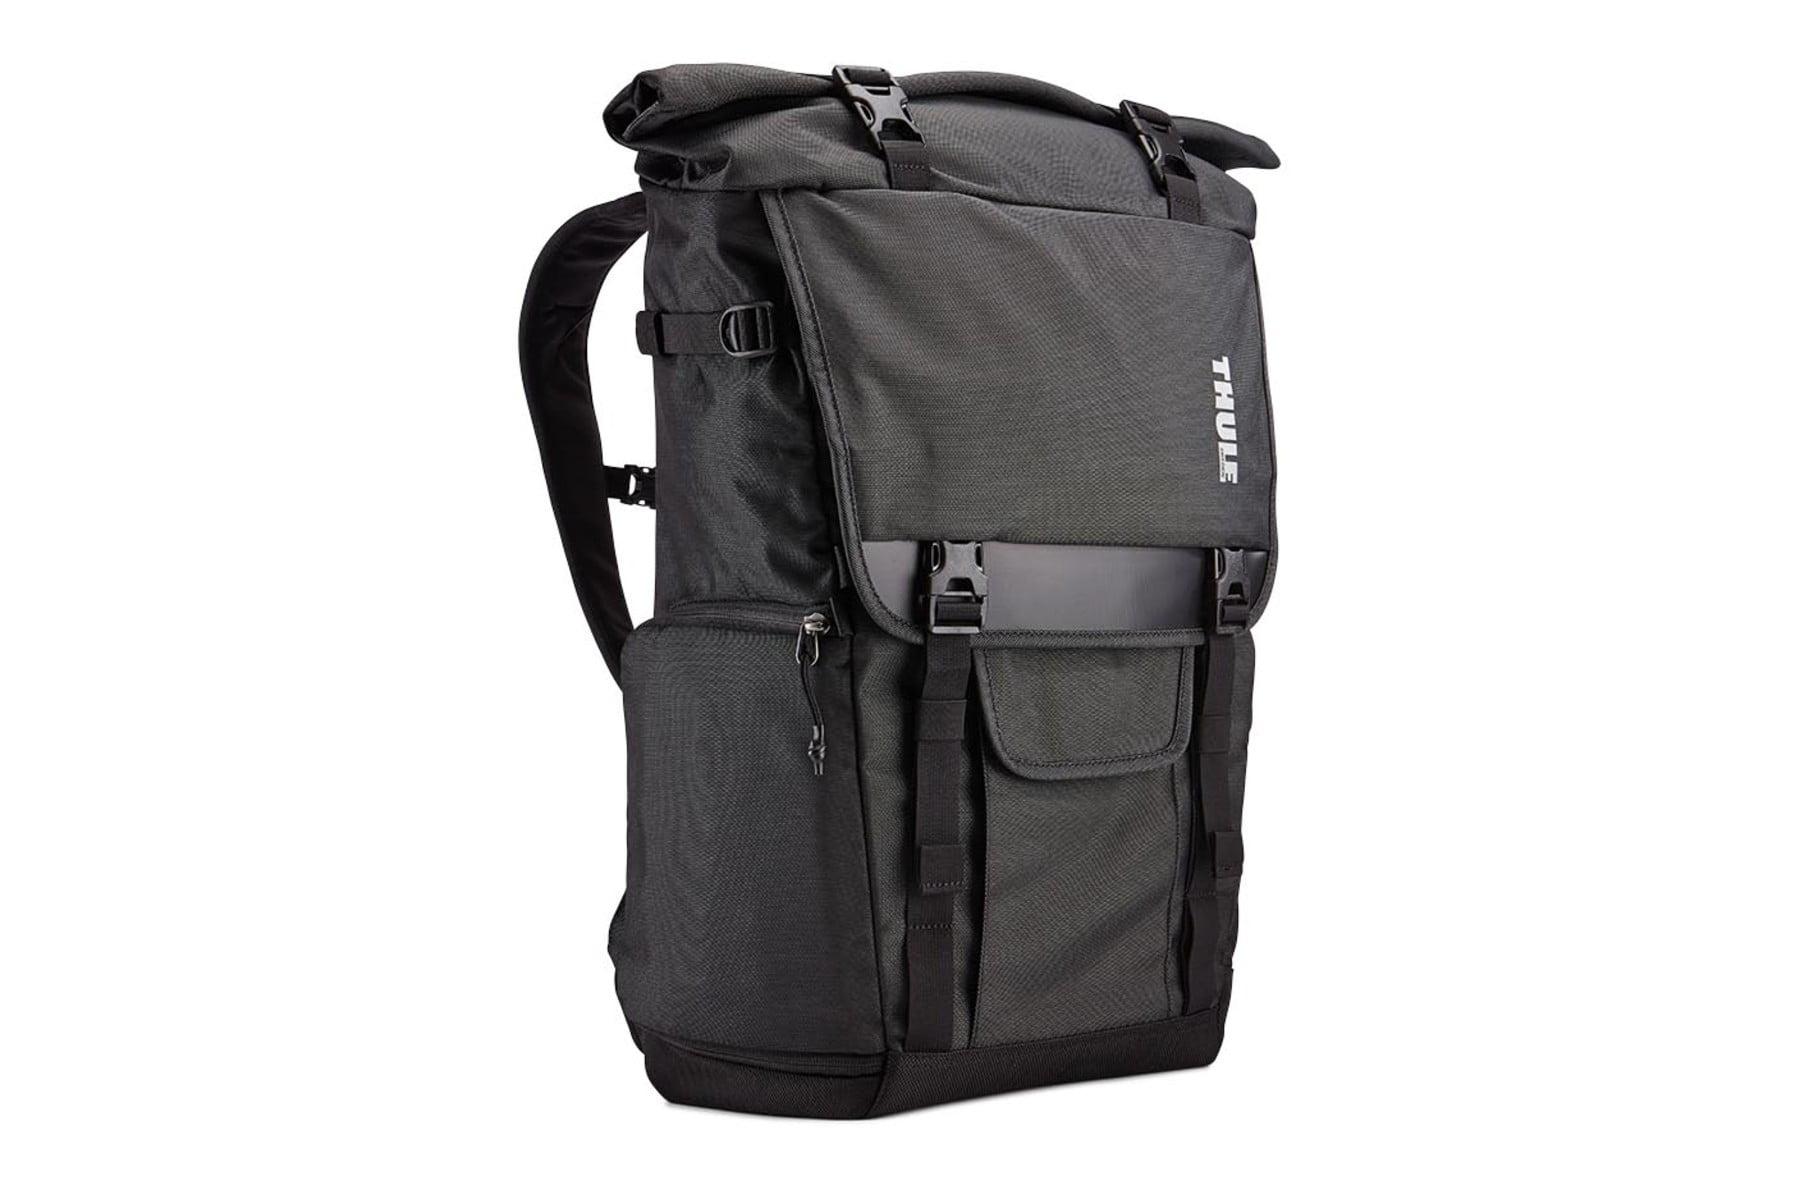 Rucsac foto Thule Covert DSLR Backpack Dark Shadow 1